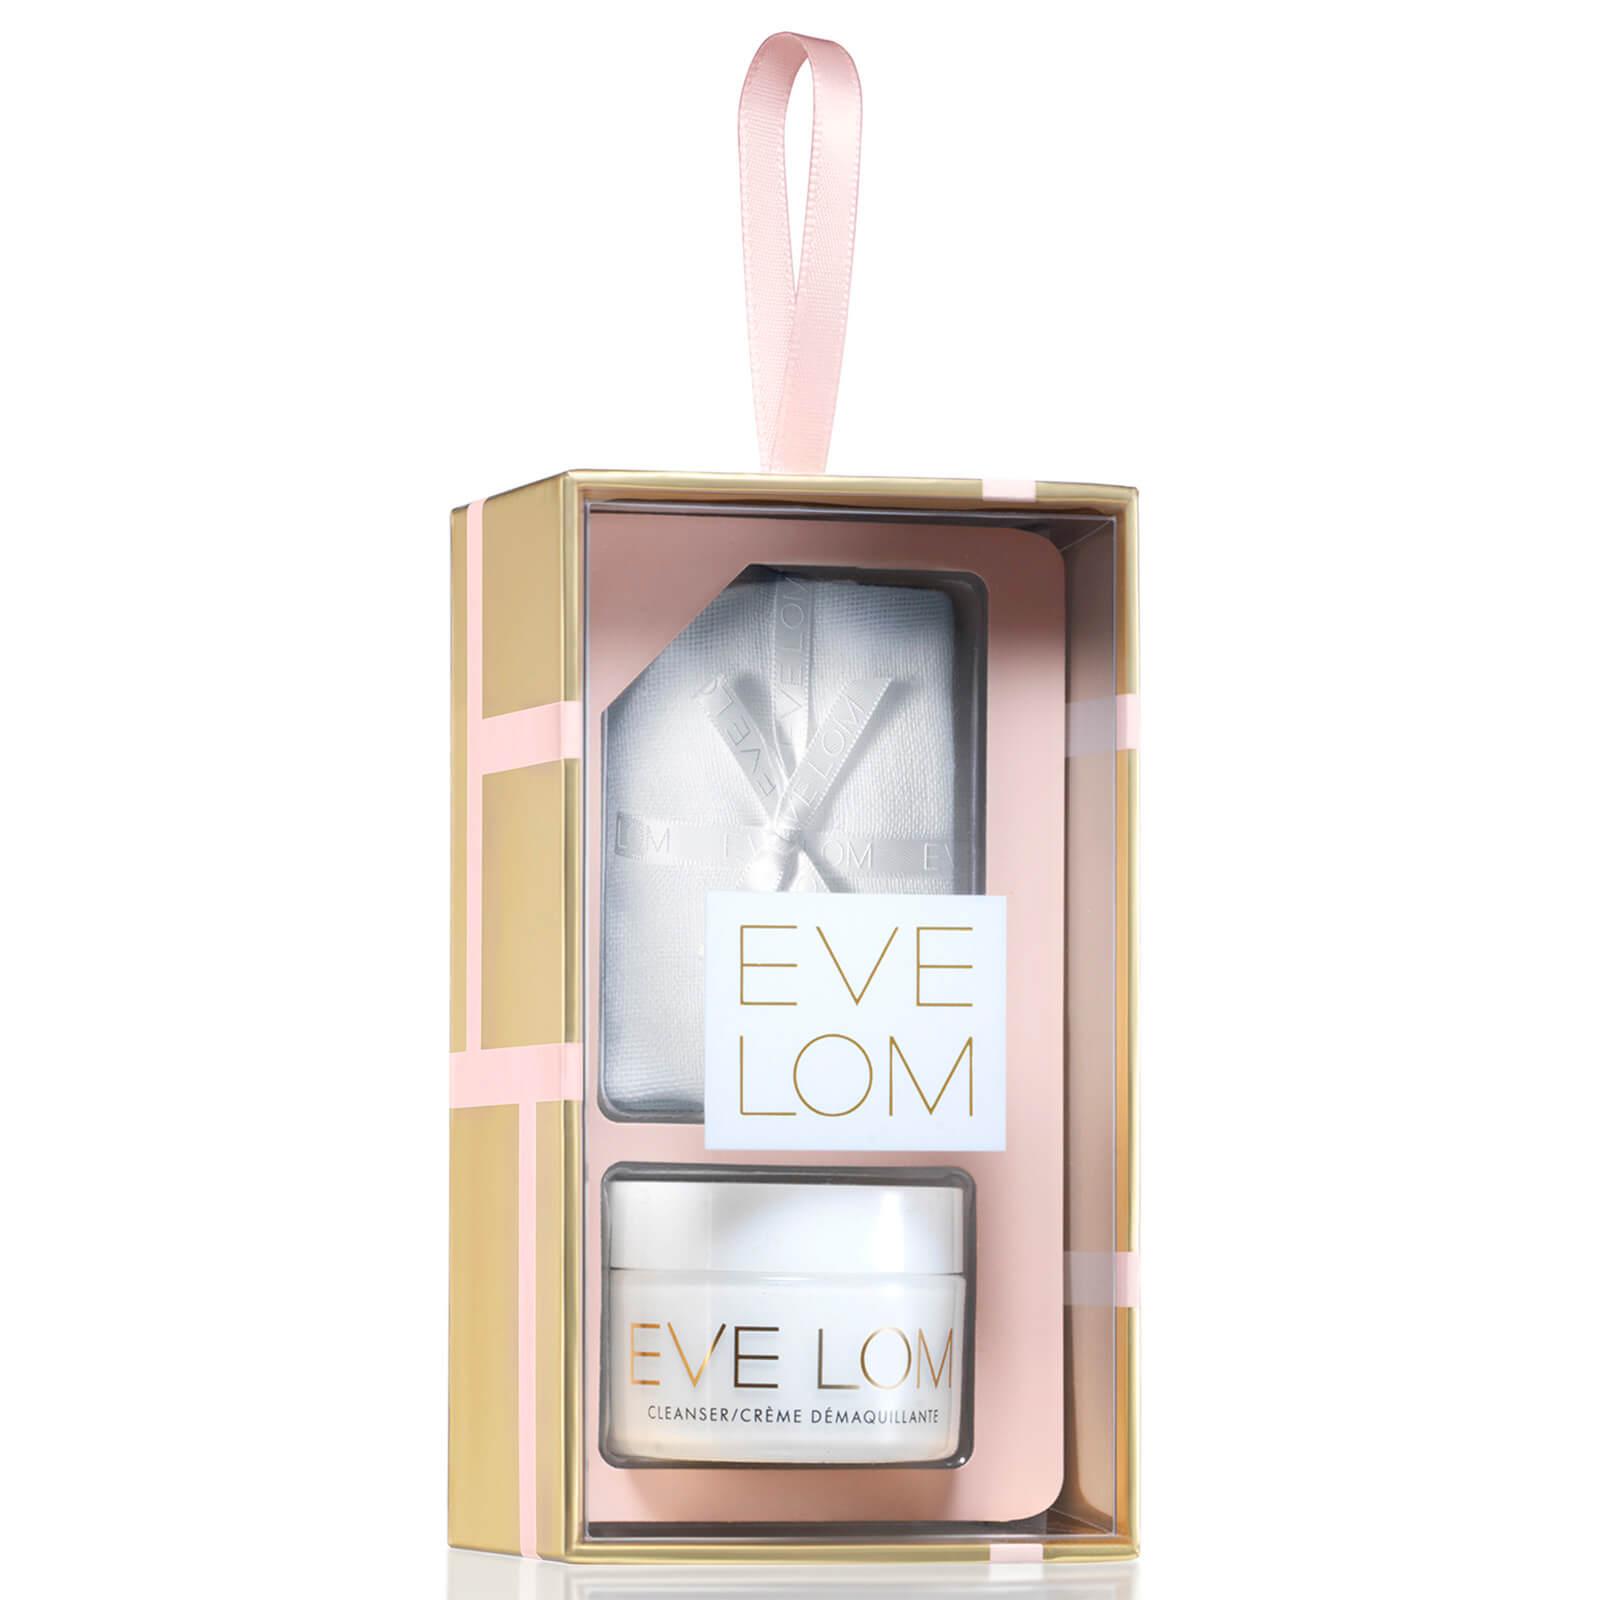 Купить Eve Lom Holiday Iconic Cleanse Ornament Set